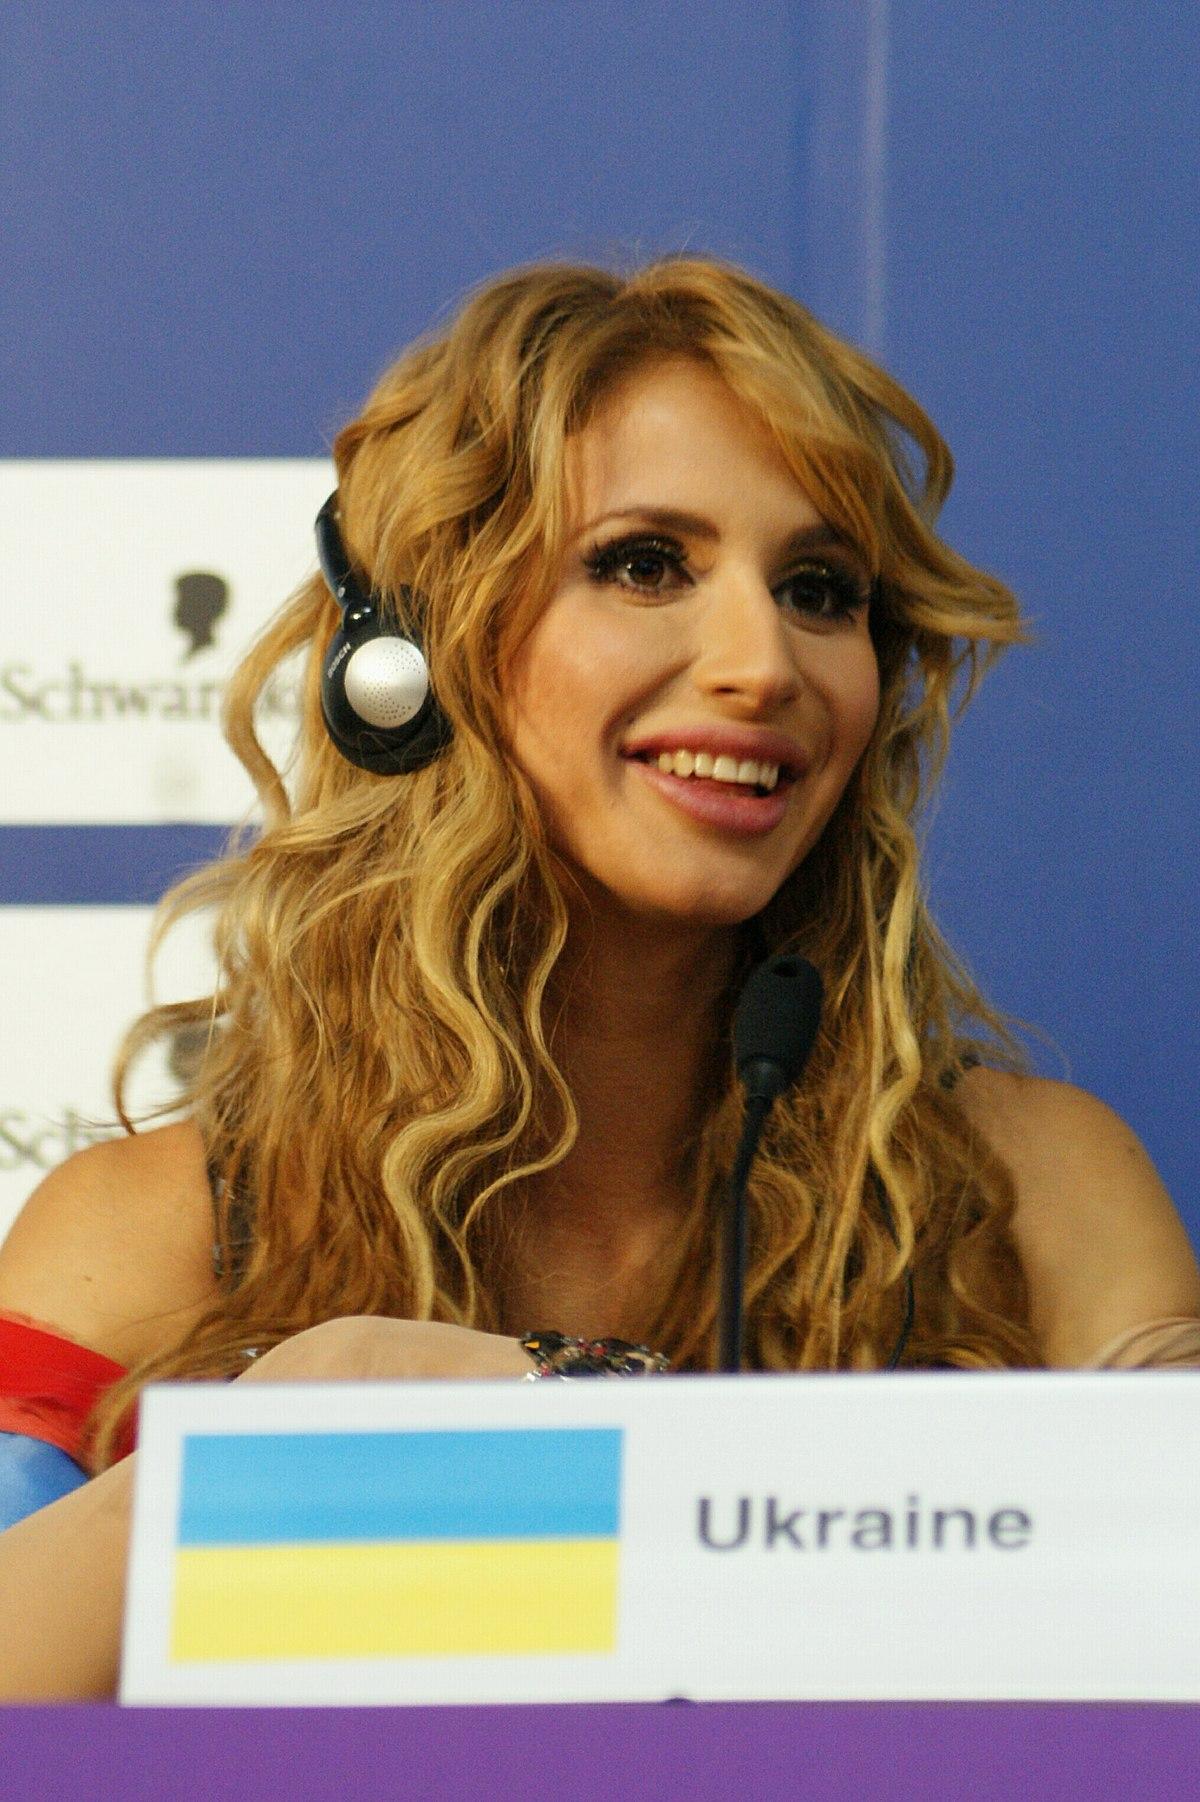 Tatyana Kotova leaves VIA Gra 20.03.2010